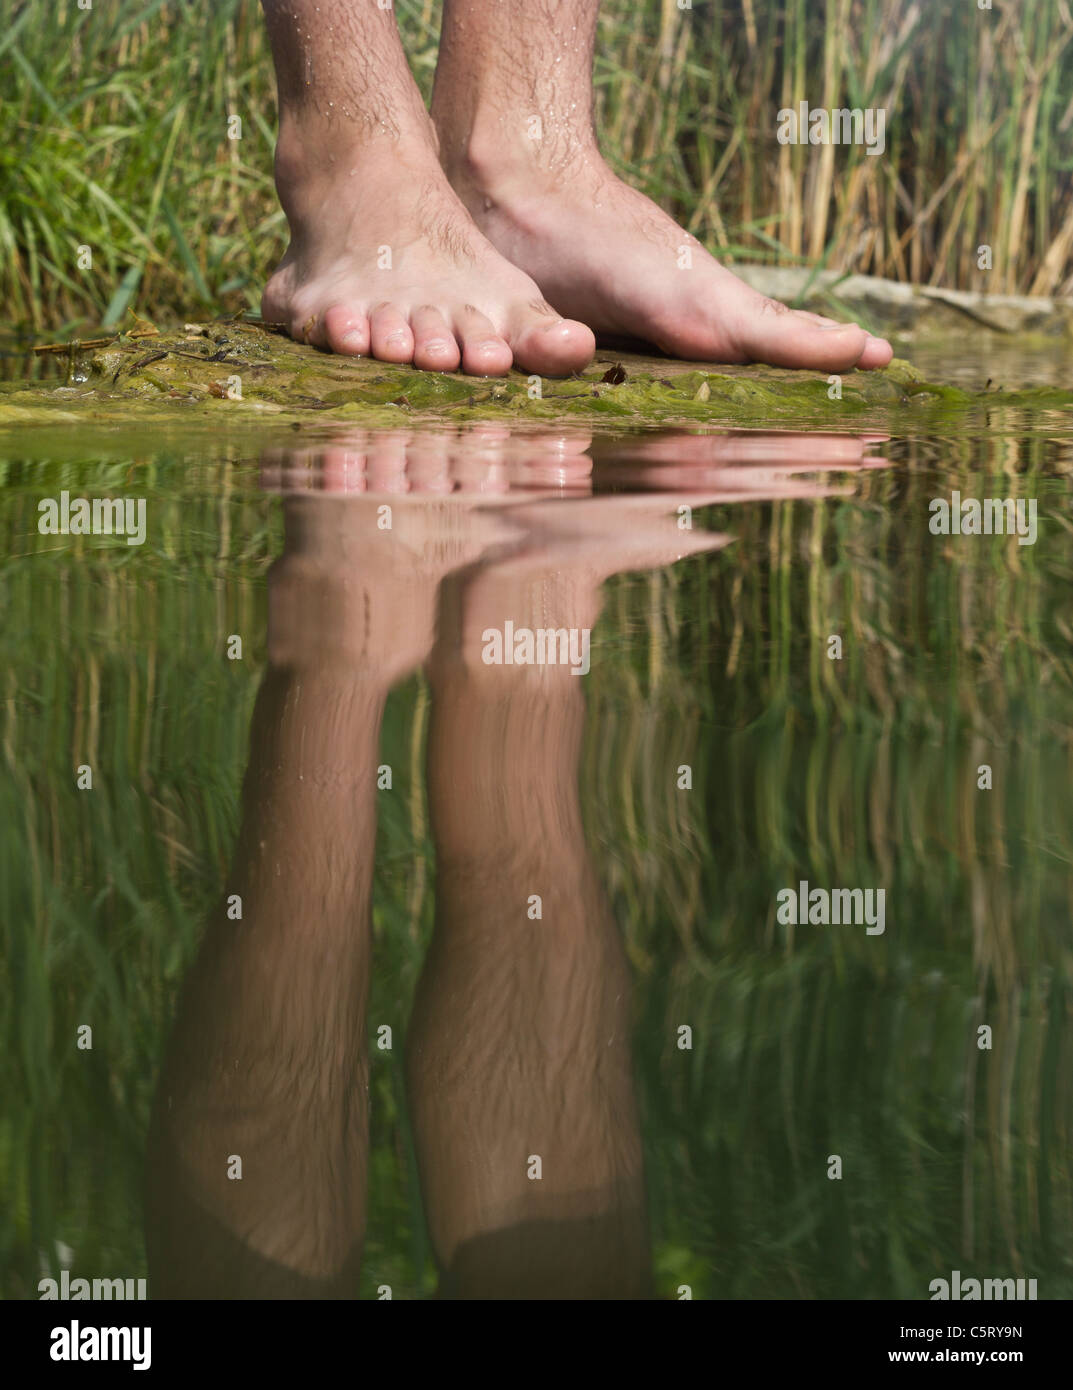 Austria, Vienna, Reflection of man's feet on lakeshore, close up - Stock Image